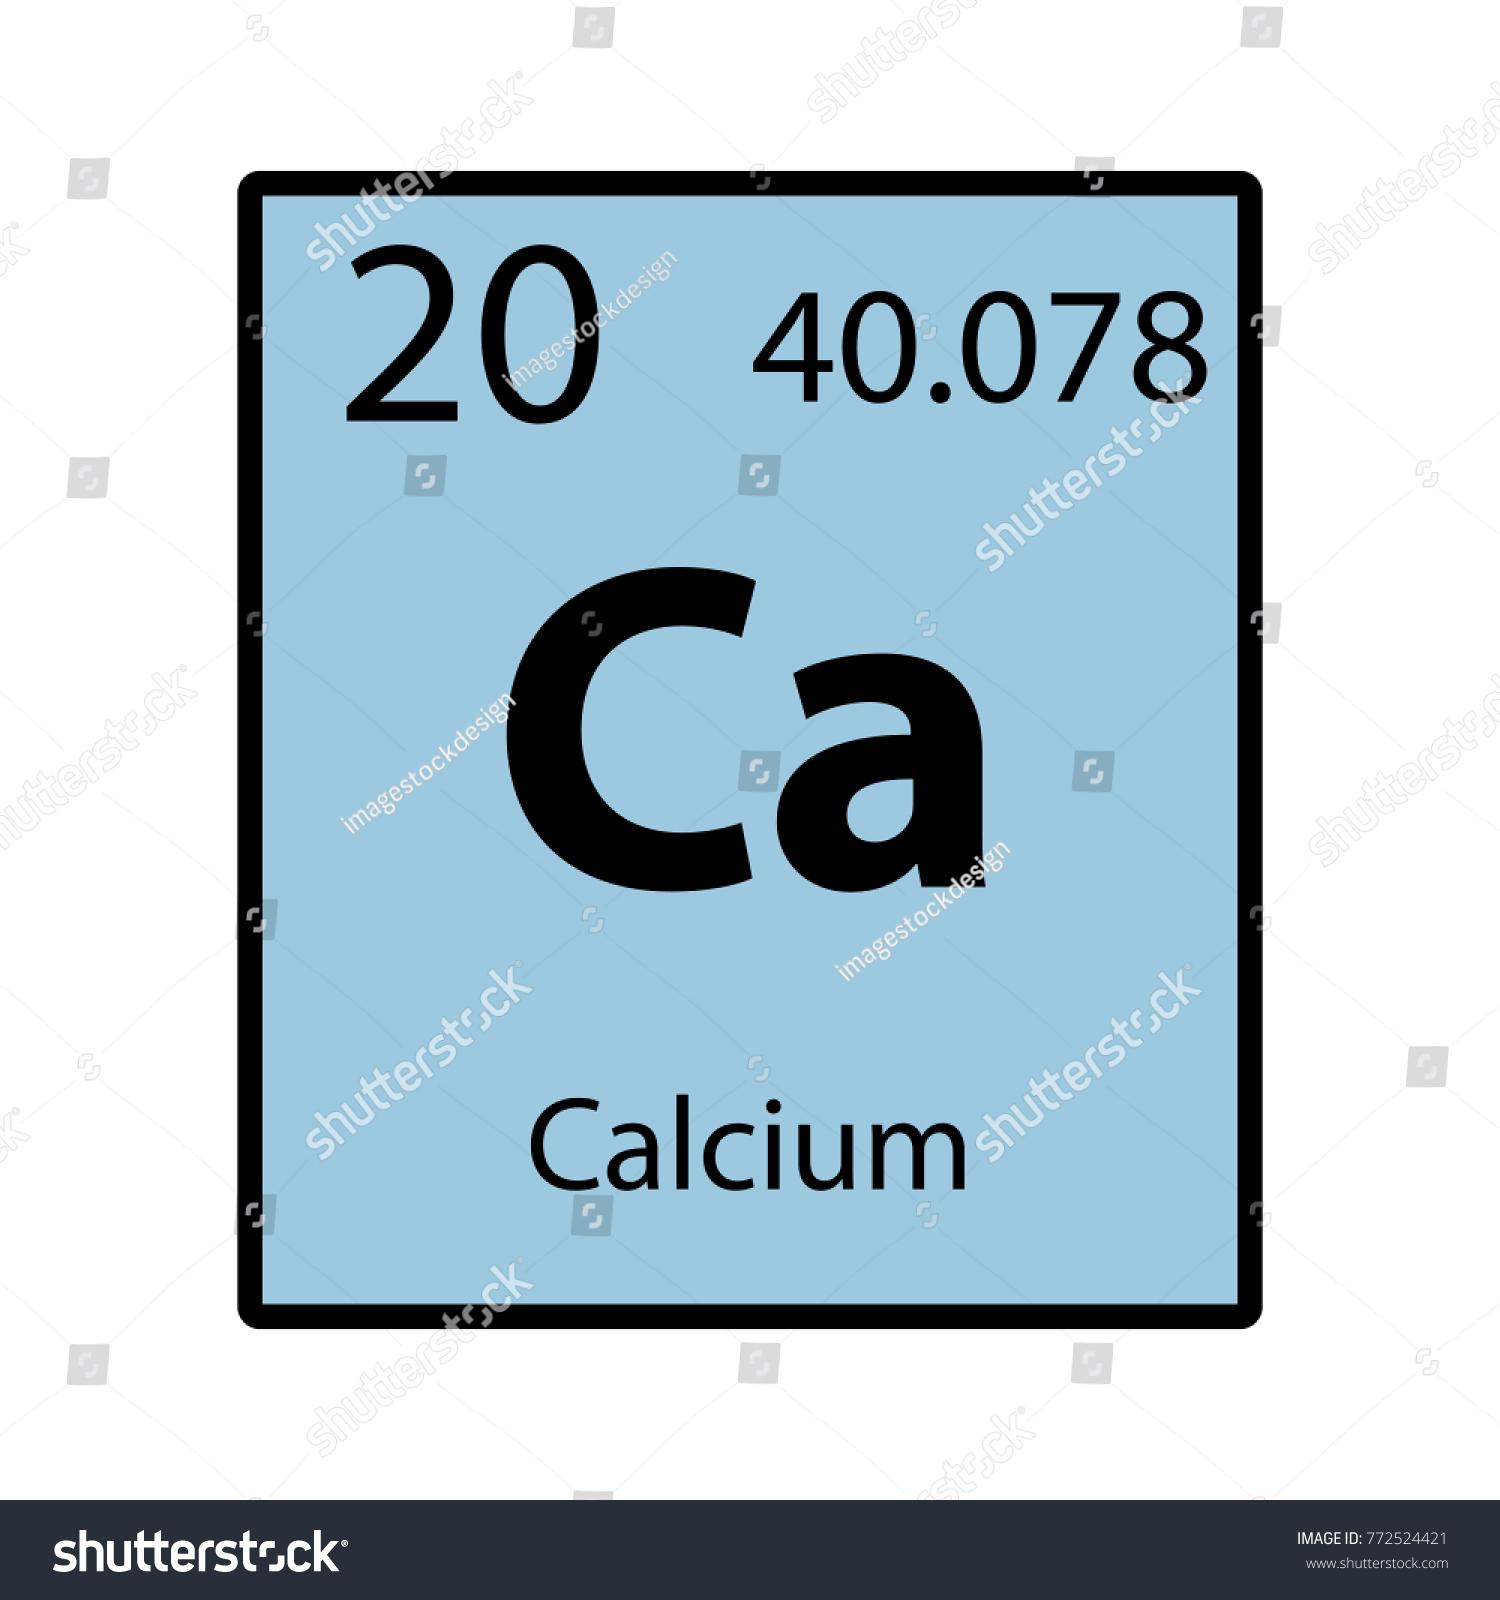 Calcium Periodic Table Element Color Icon Stock Vector 772524421